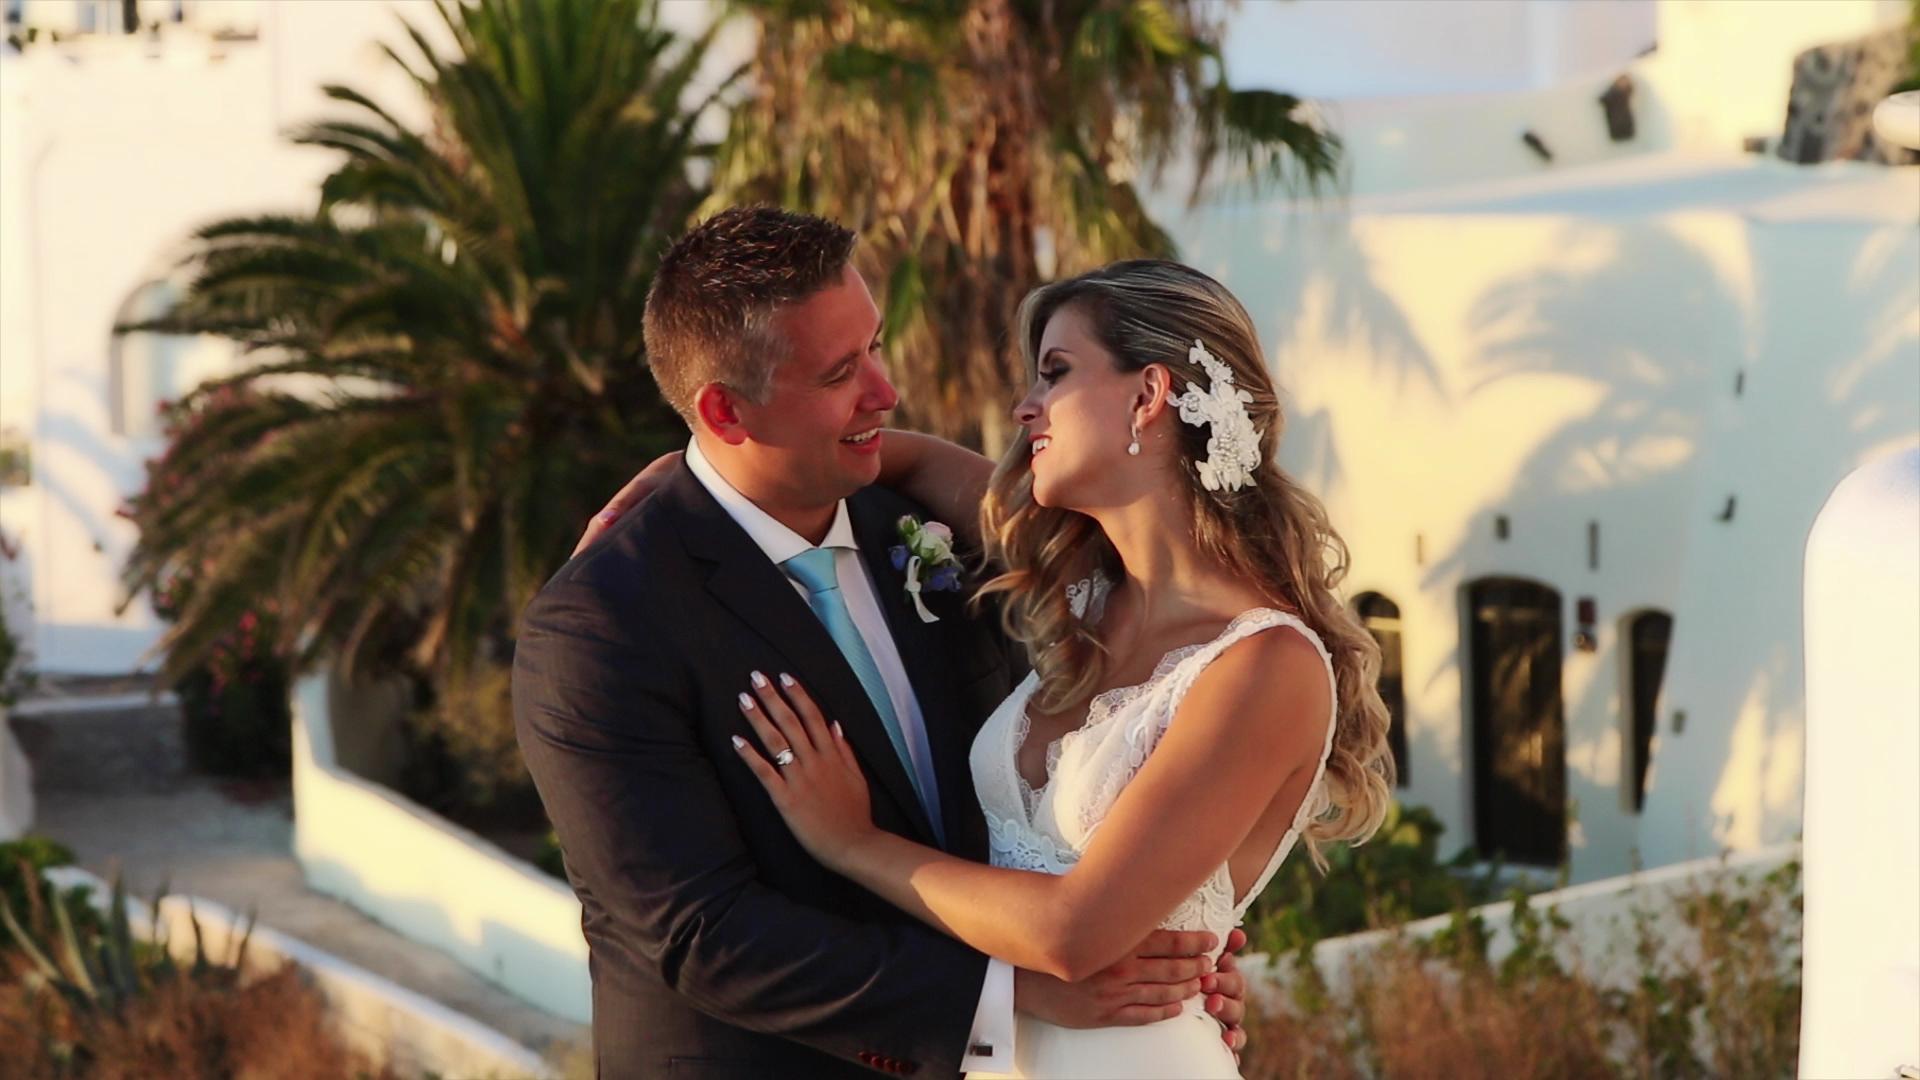 Wedding Videography in Santorini